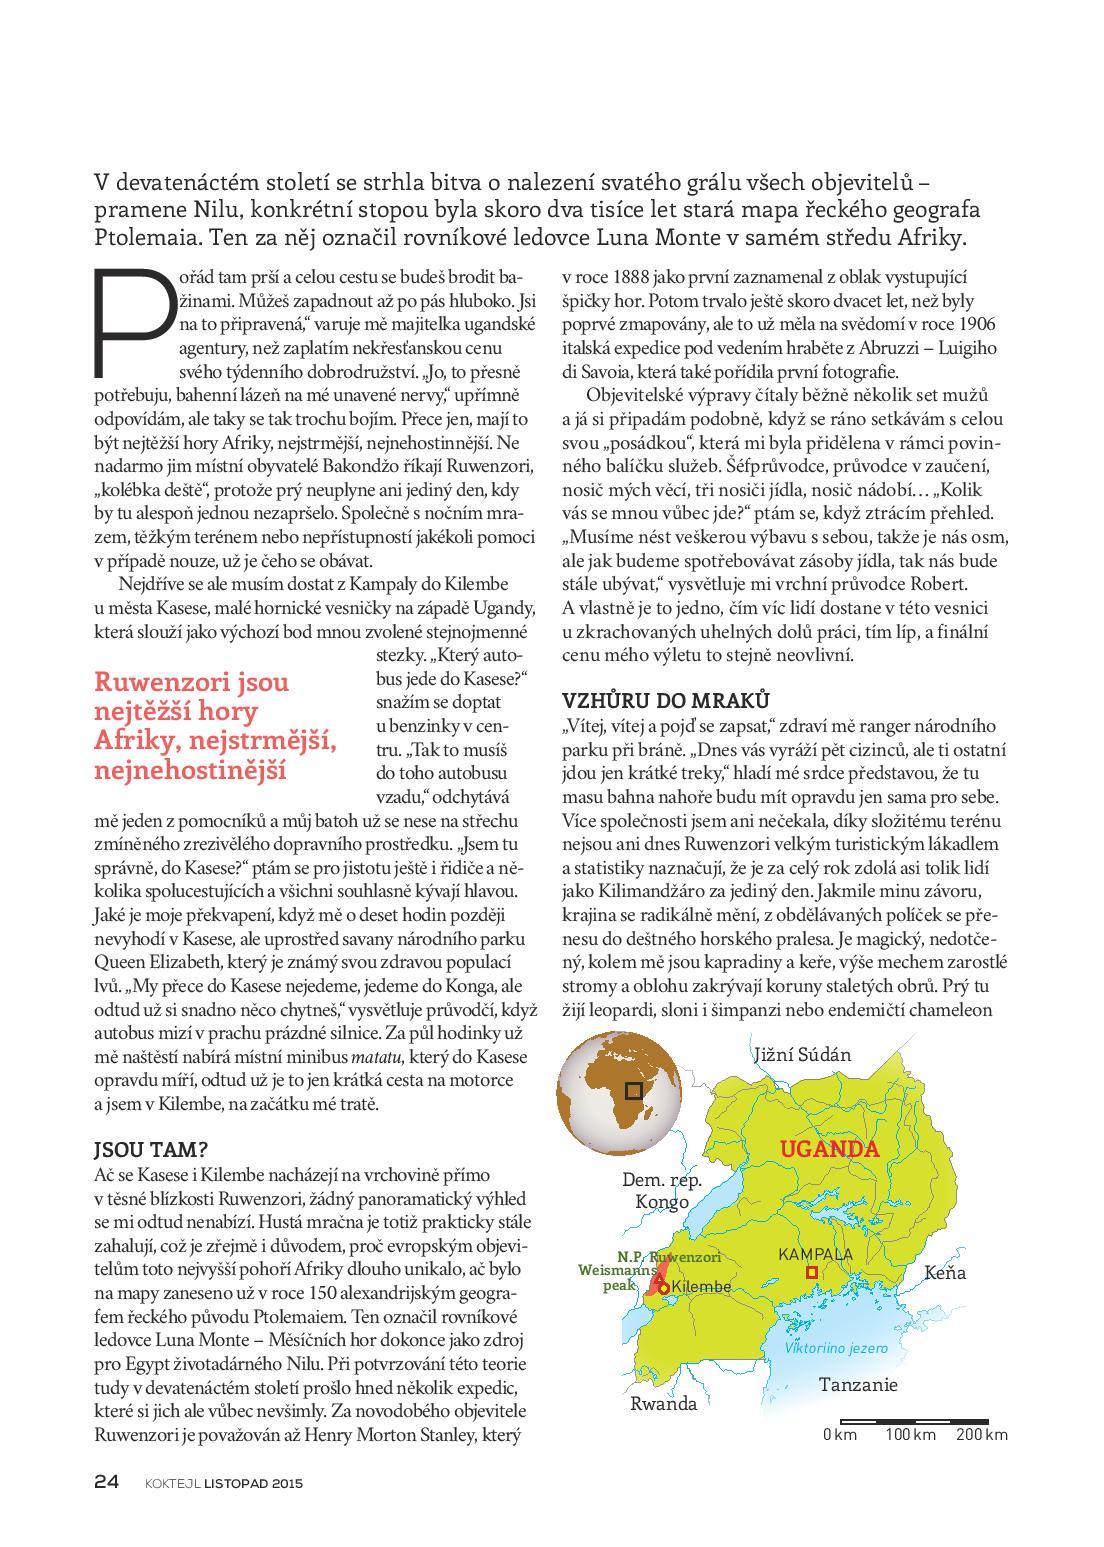 KO1511_Uganda_Ruwenzori_JS-1-page-003